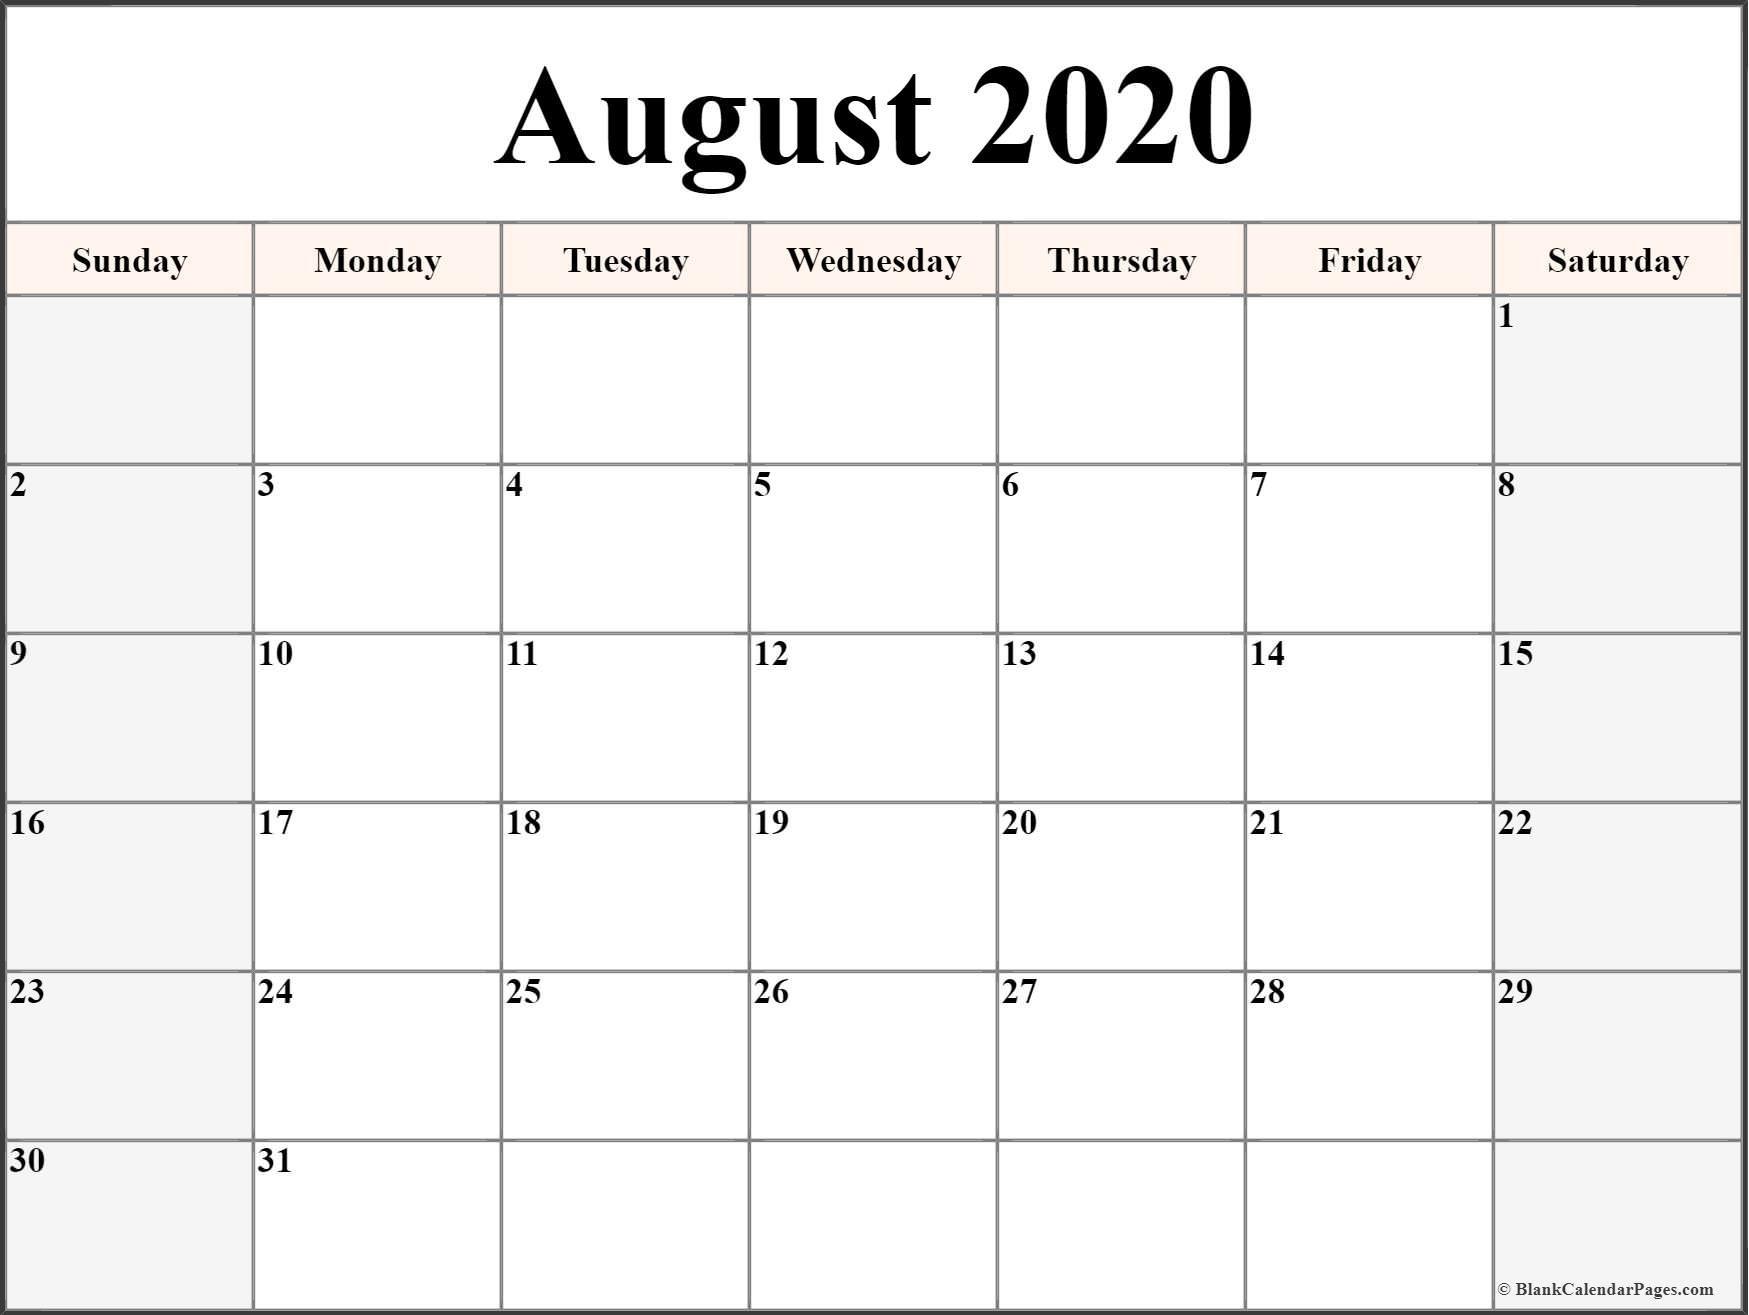 August 2020 Calendar | Free Printable Monthly Calendars  Calendar To Write On 2020